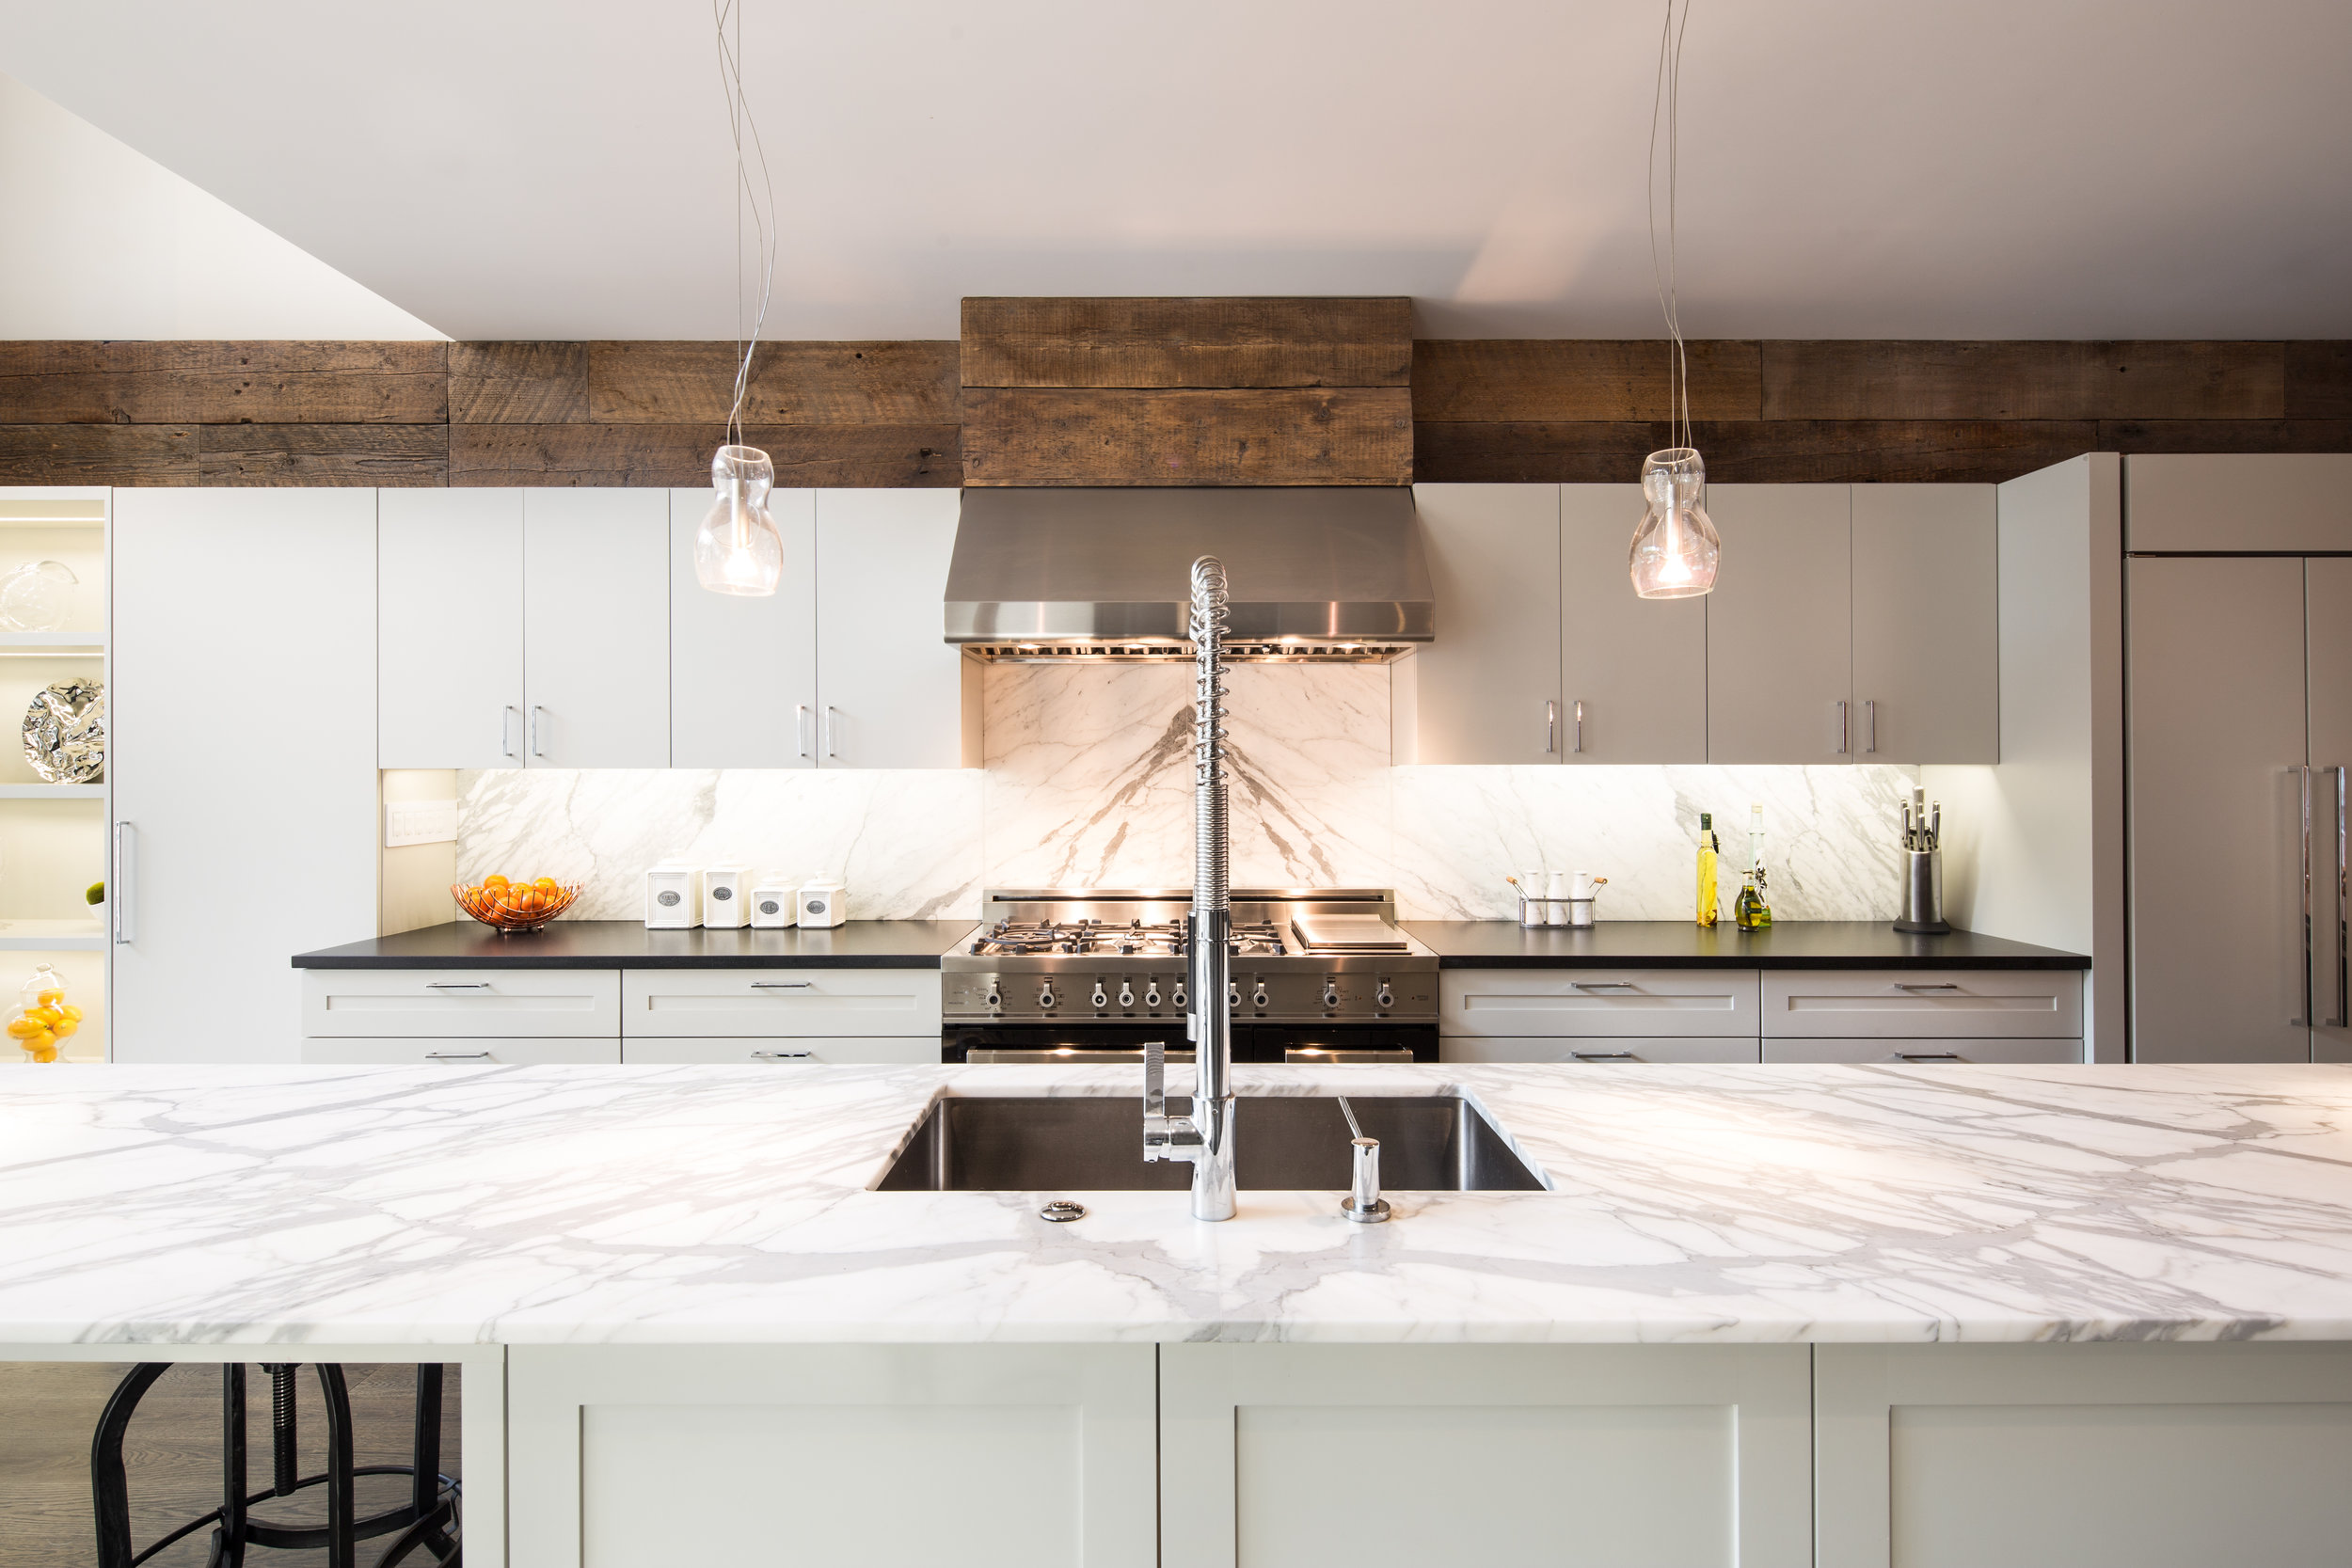 Interiors Photography - Kitchen Area